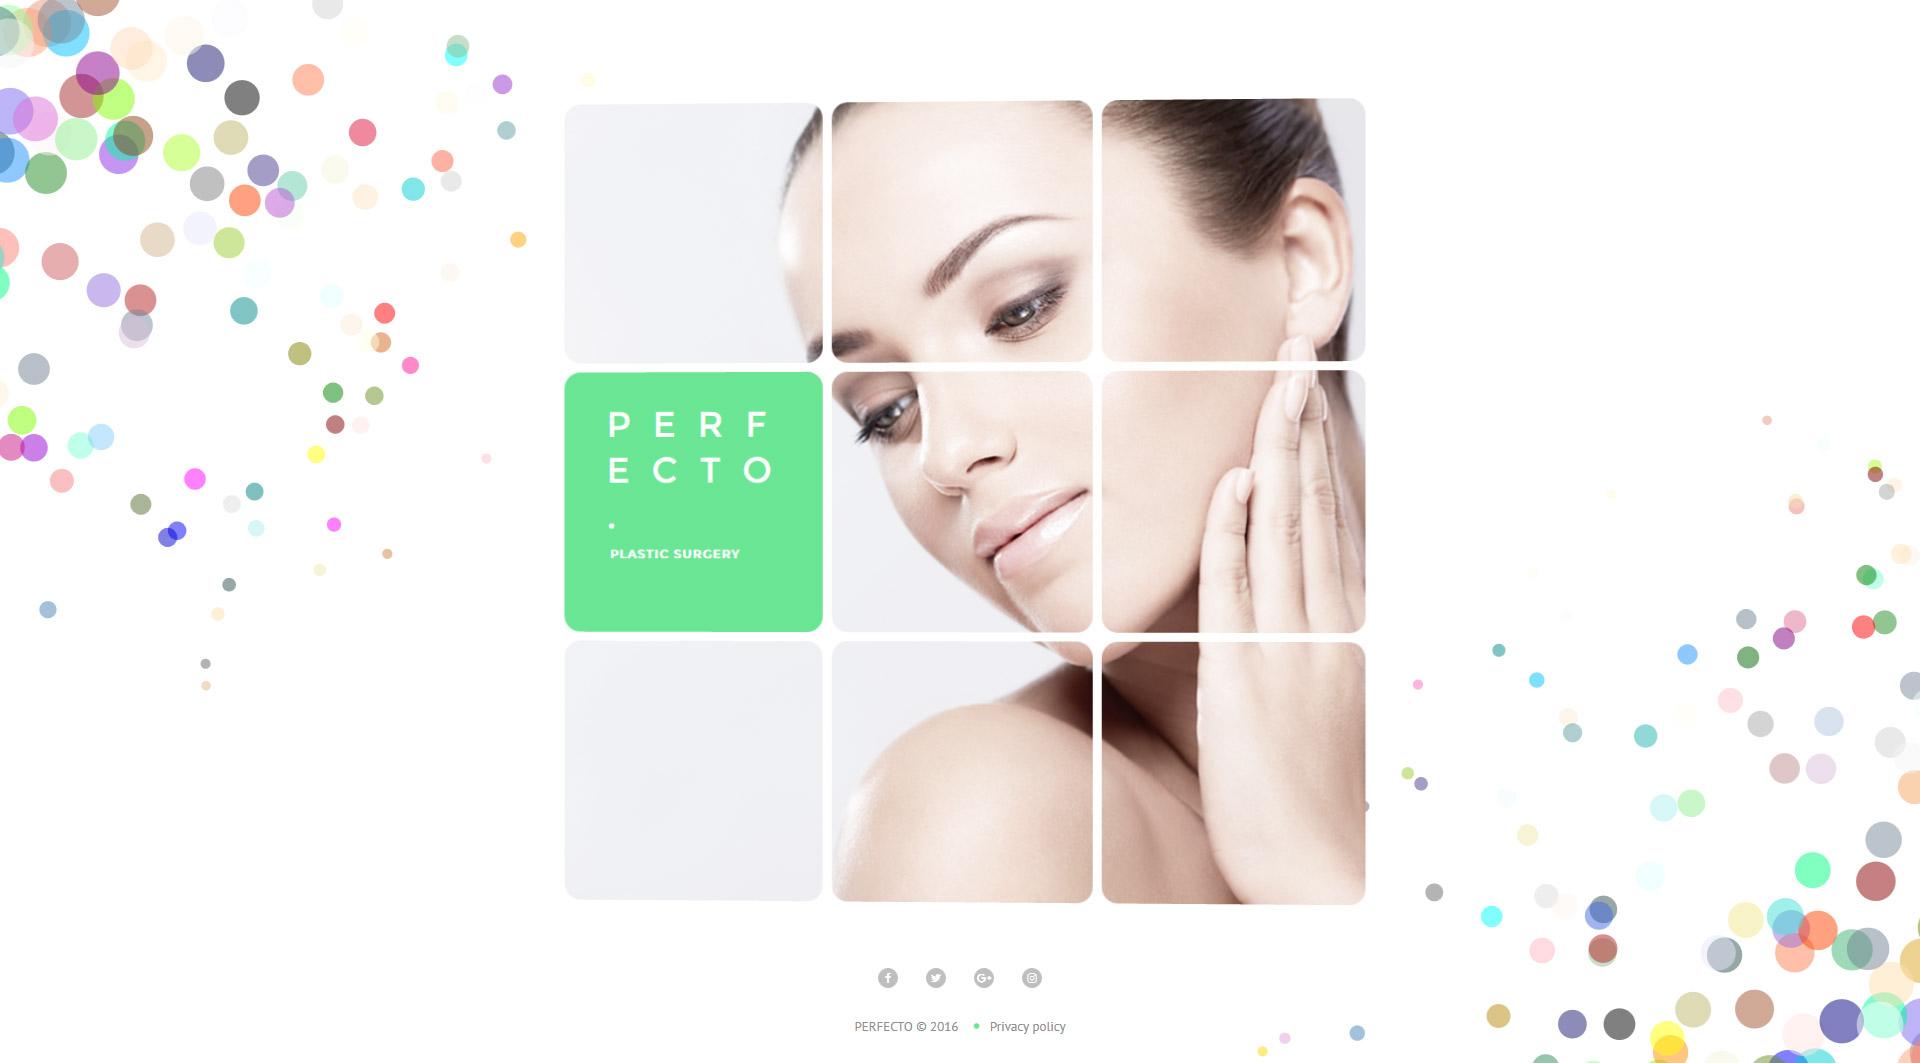 Perfecto - Plastic Surgery Website Template